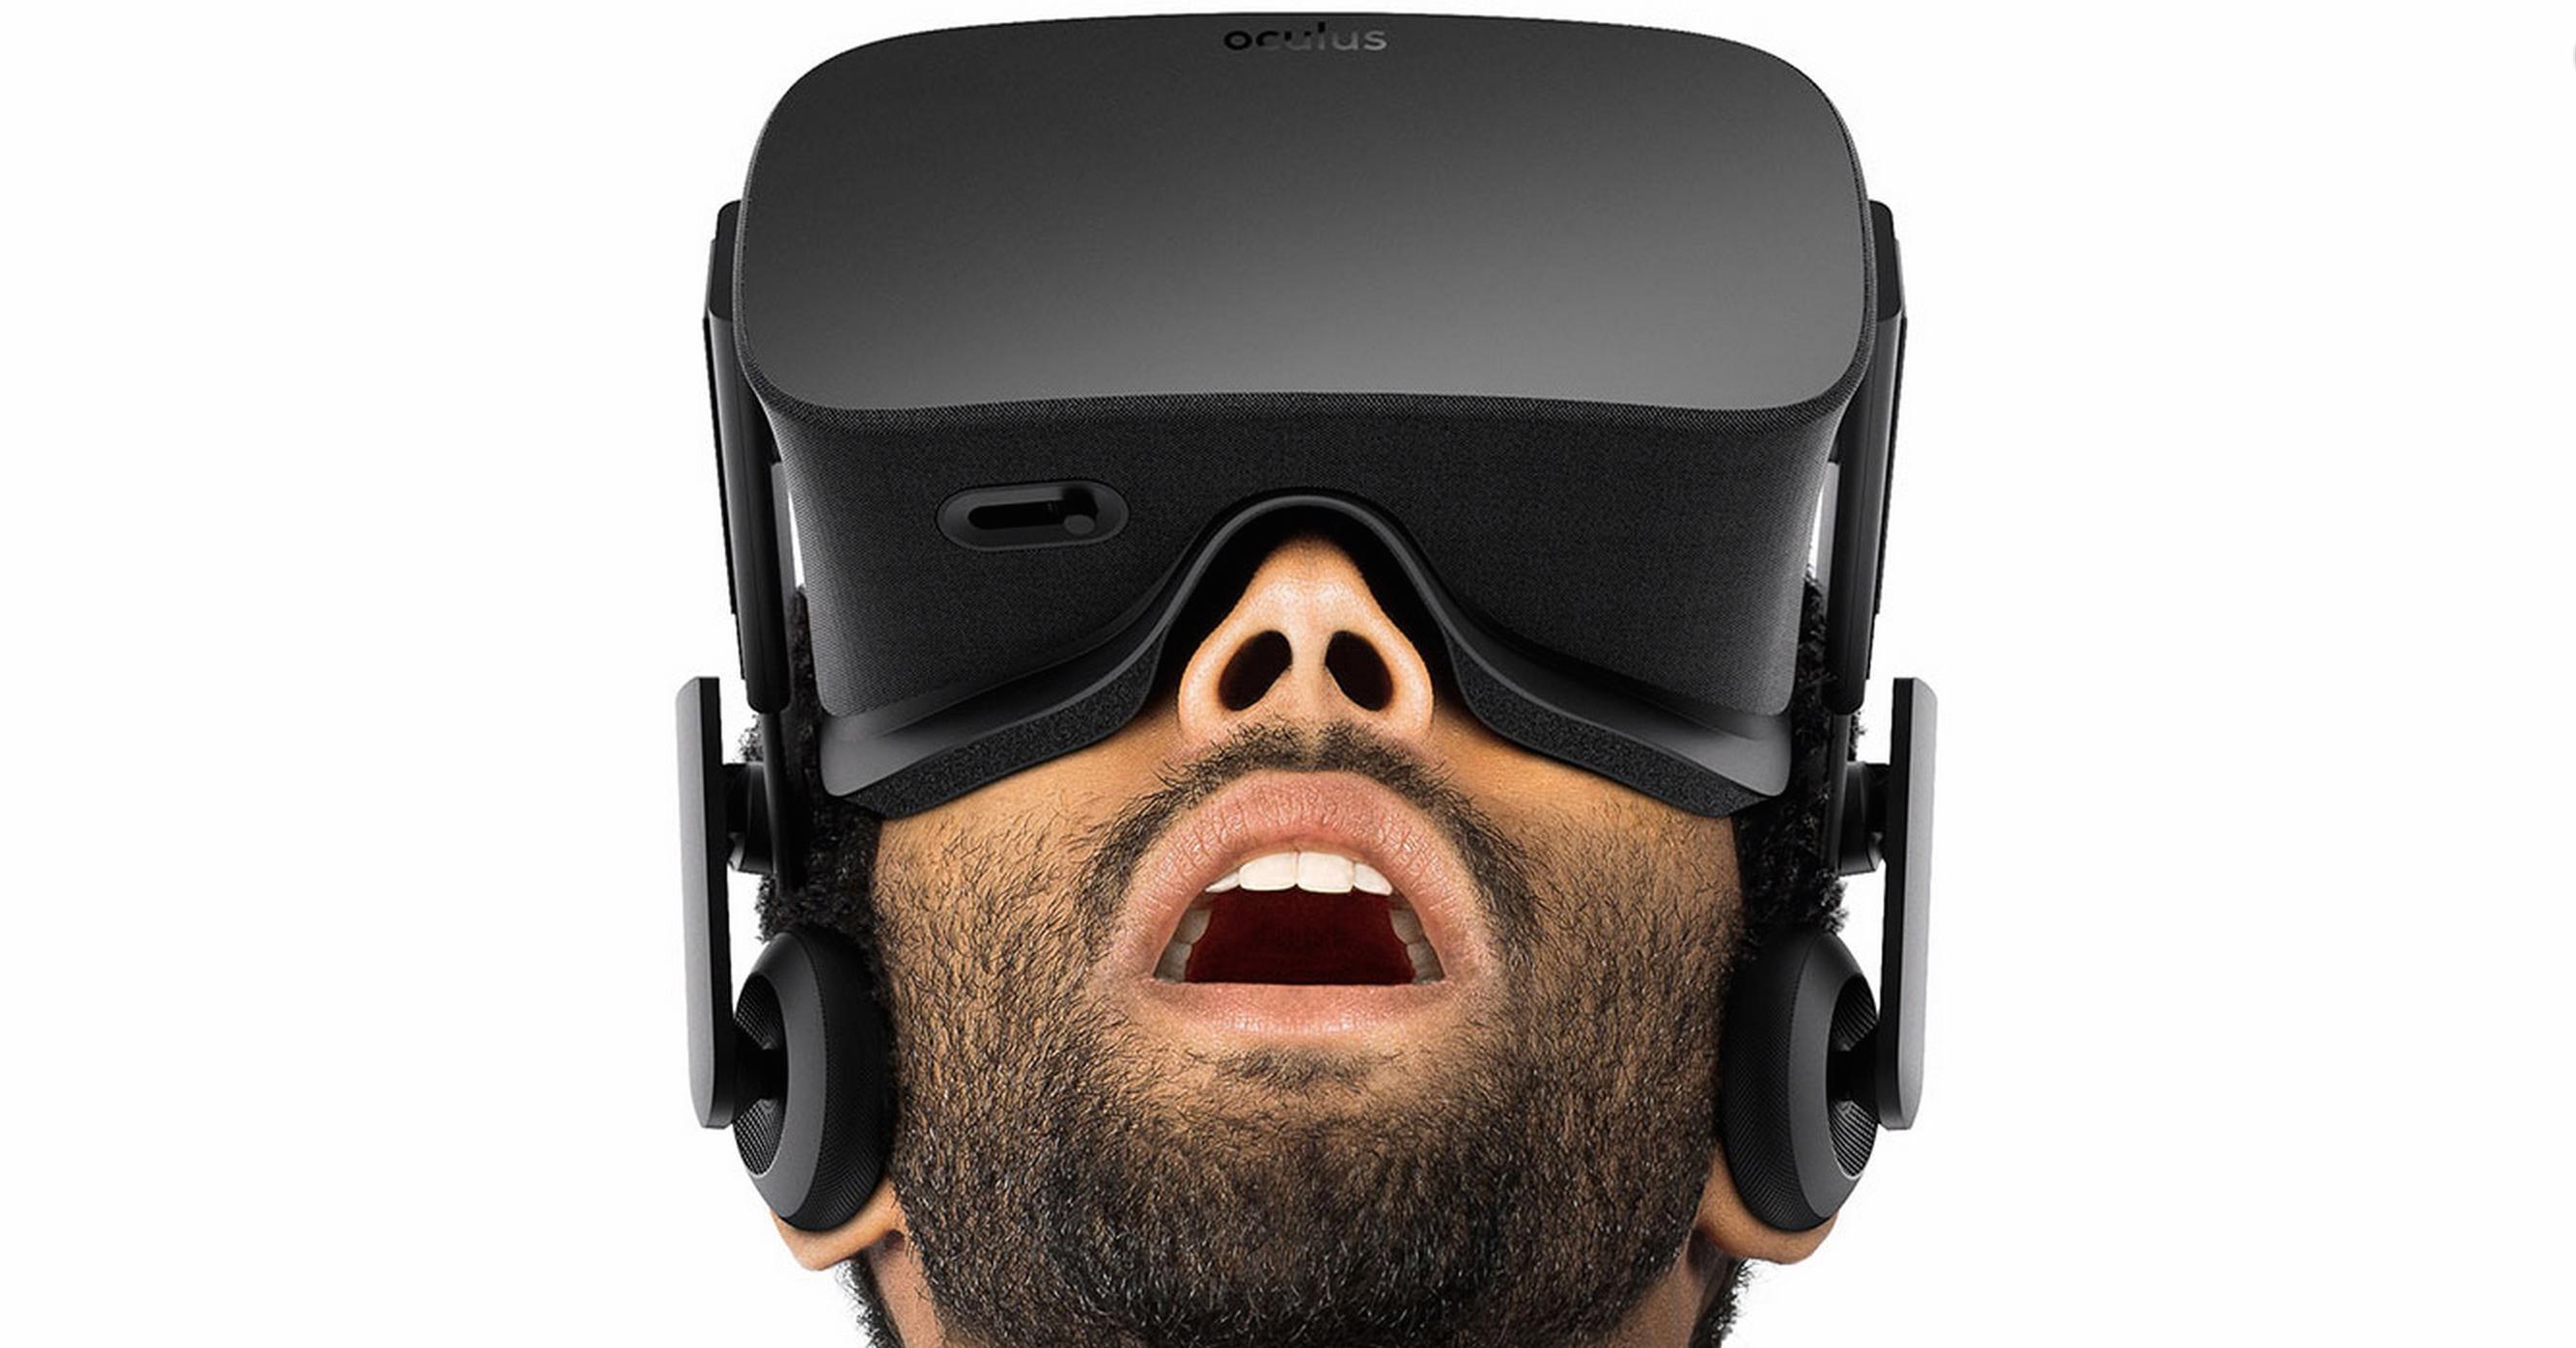 Oculus Rift tecnología